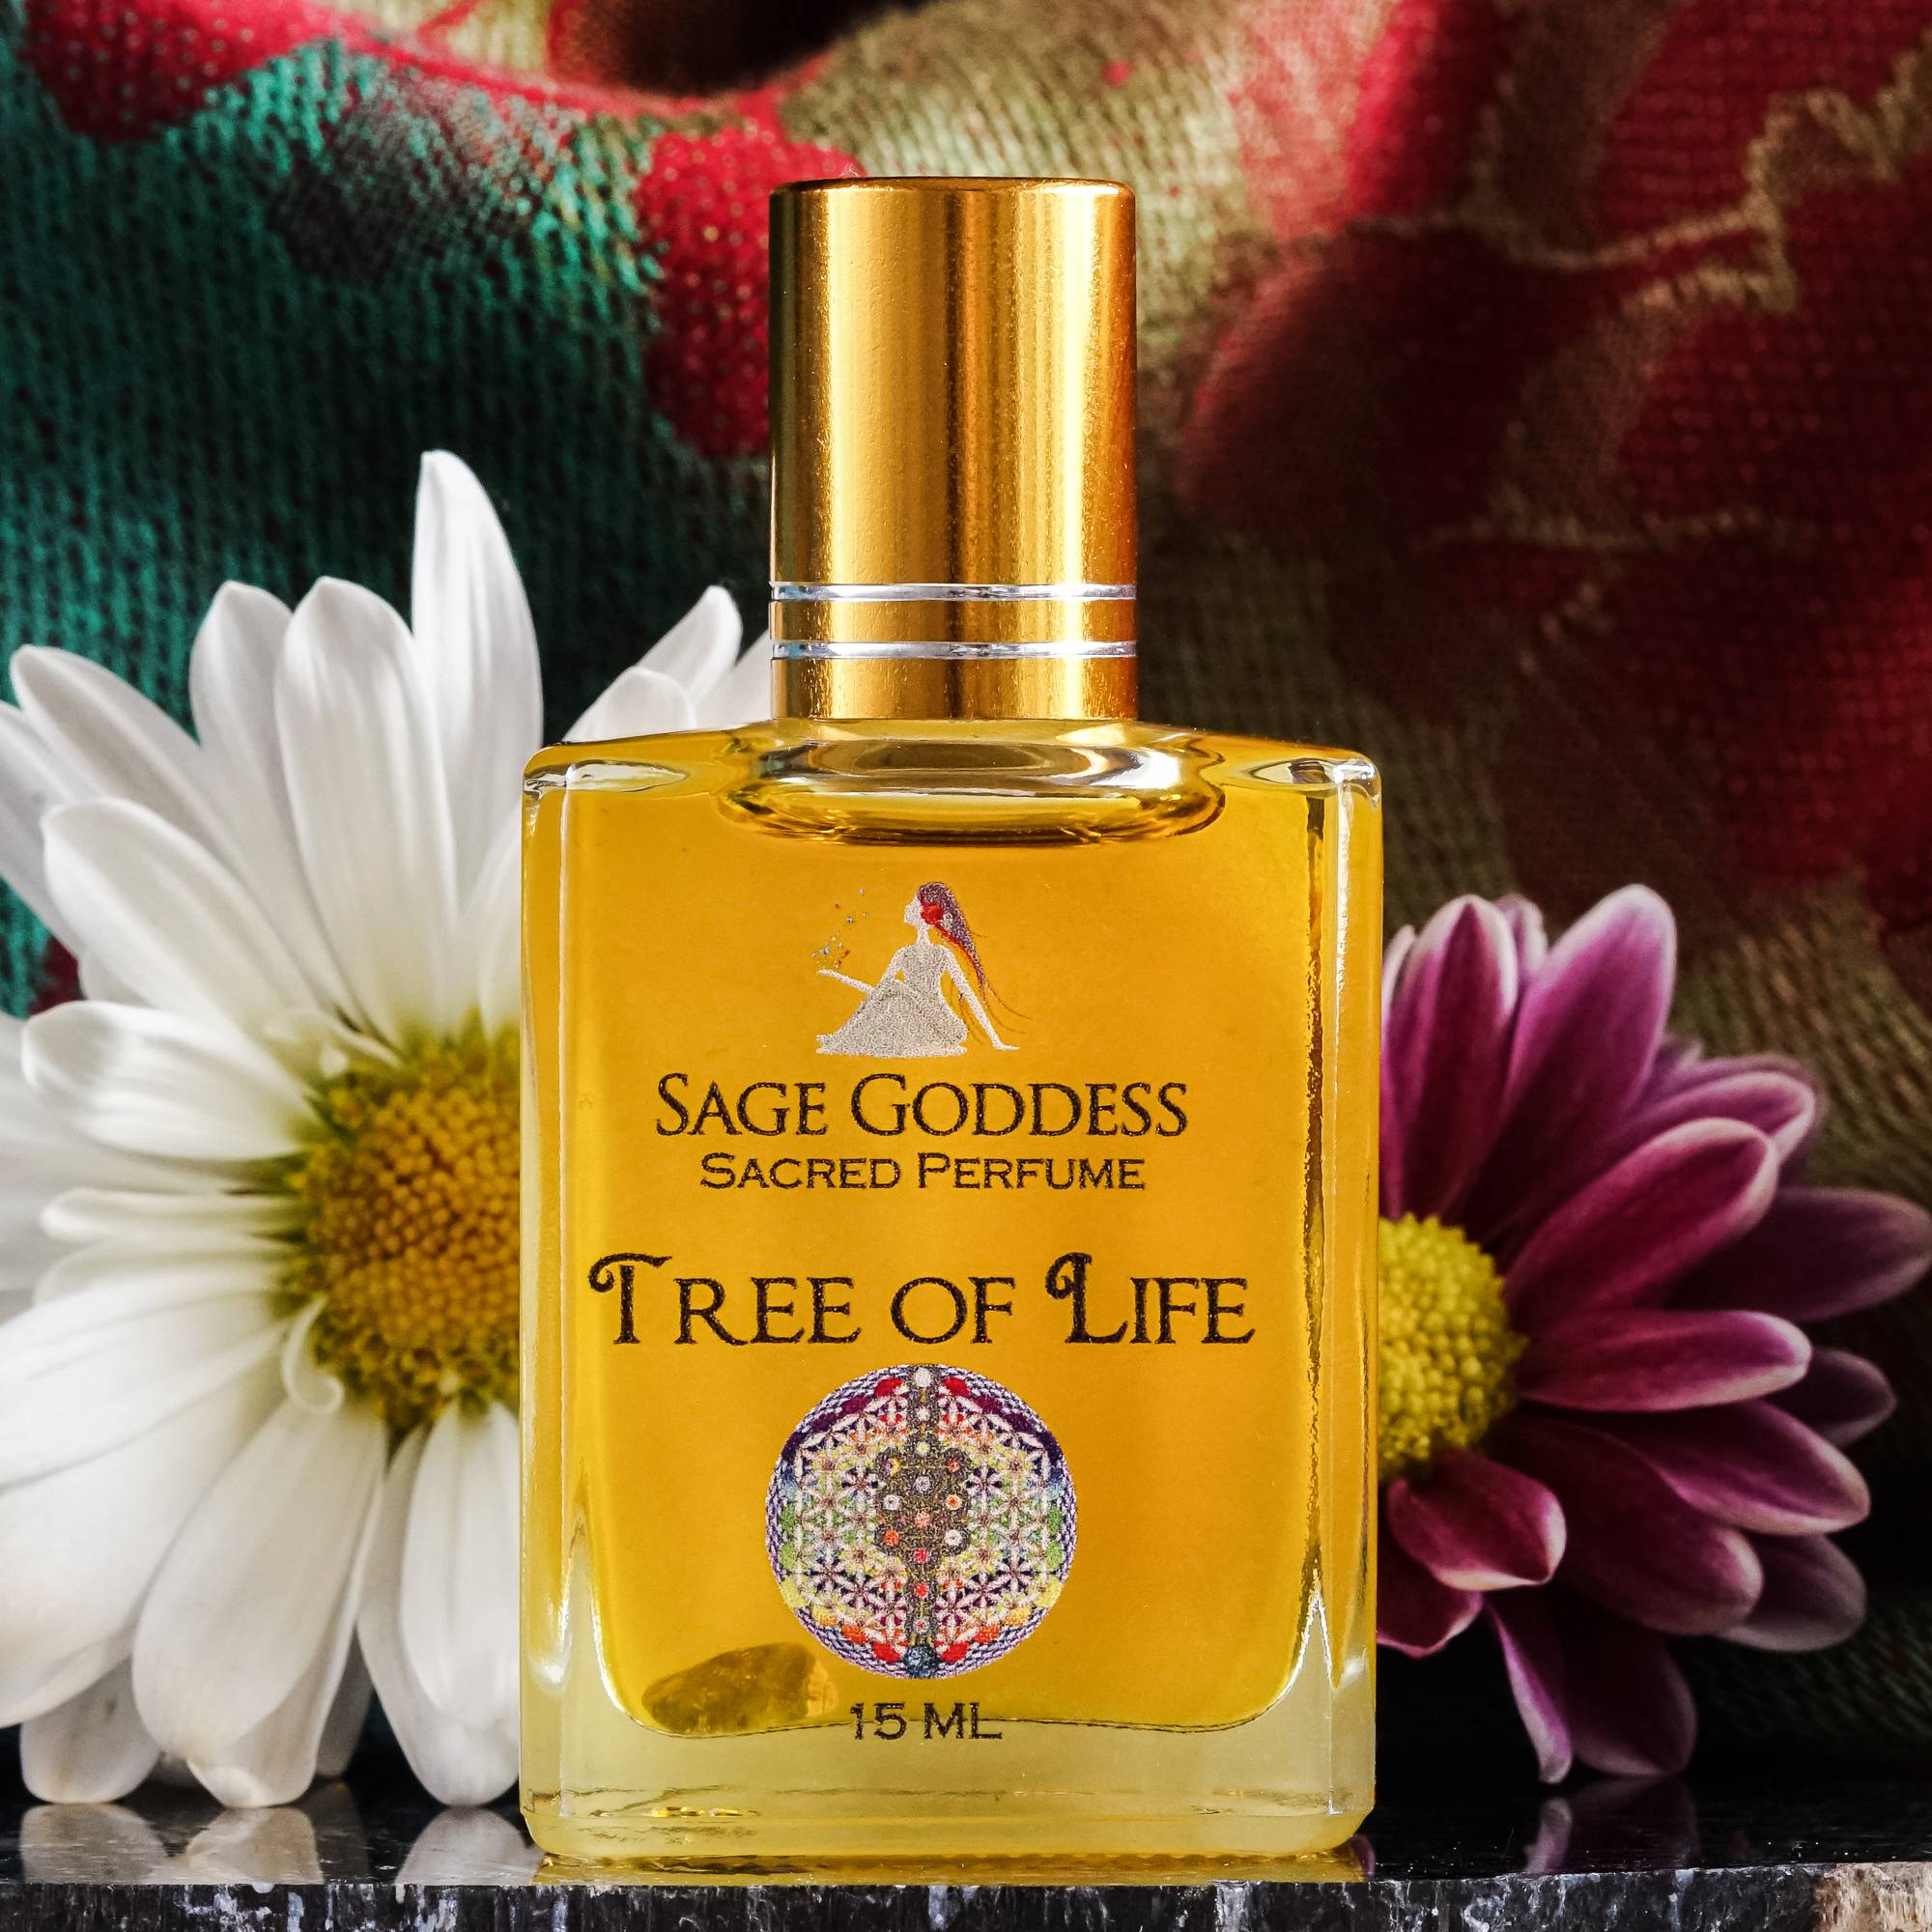 Tree of Life perfume